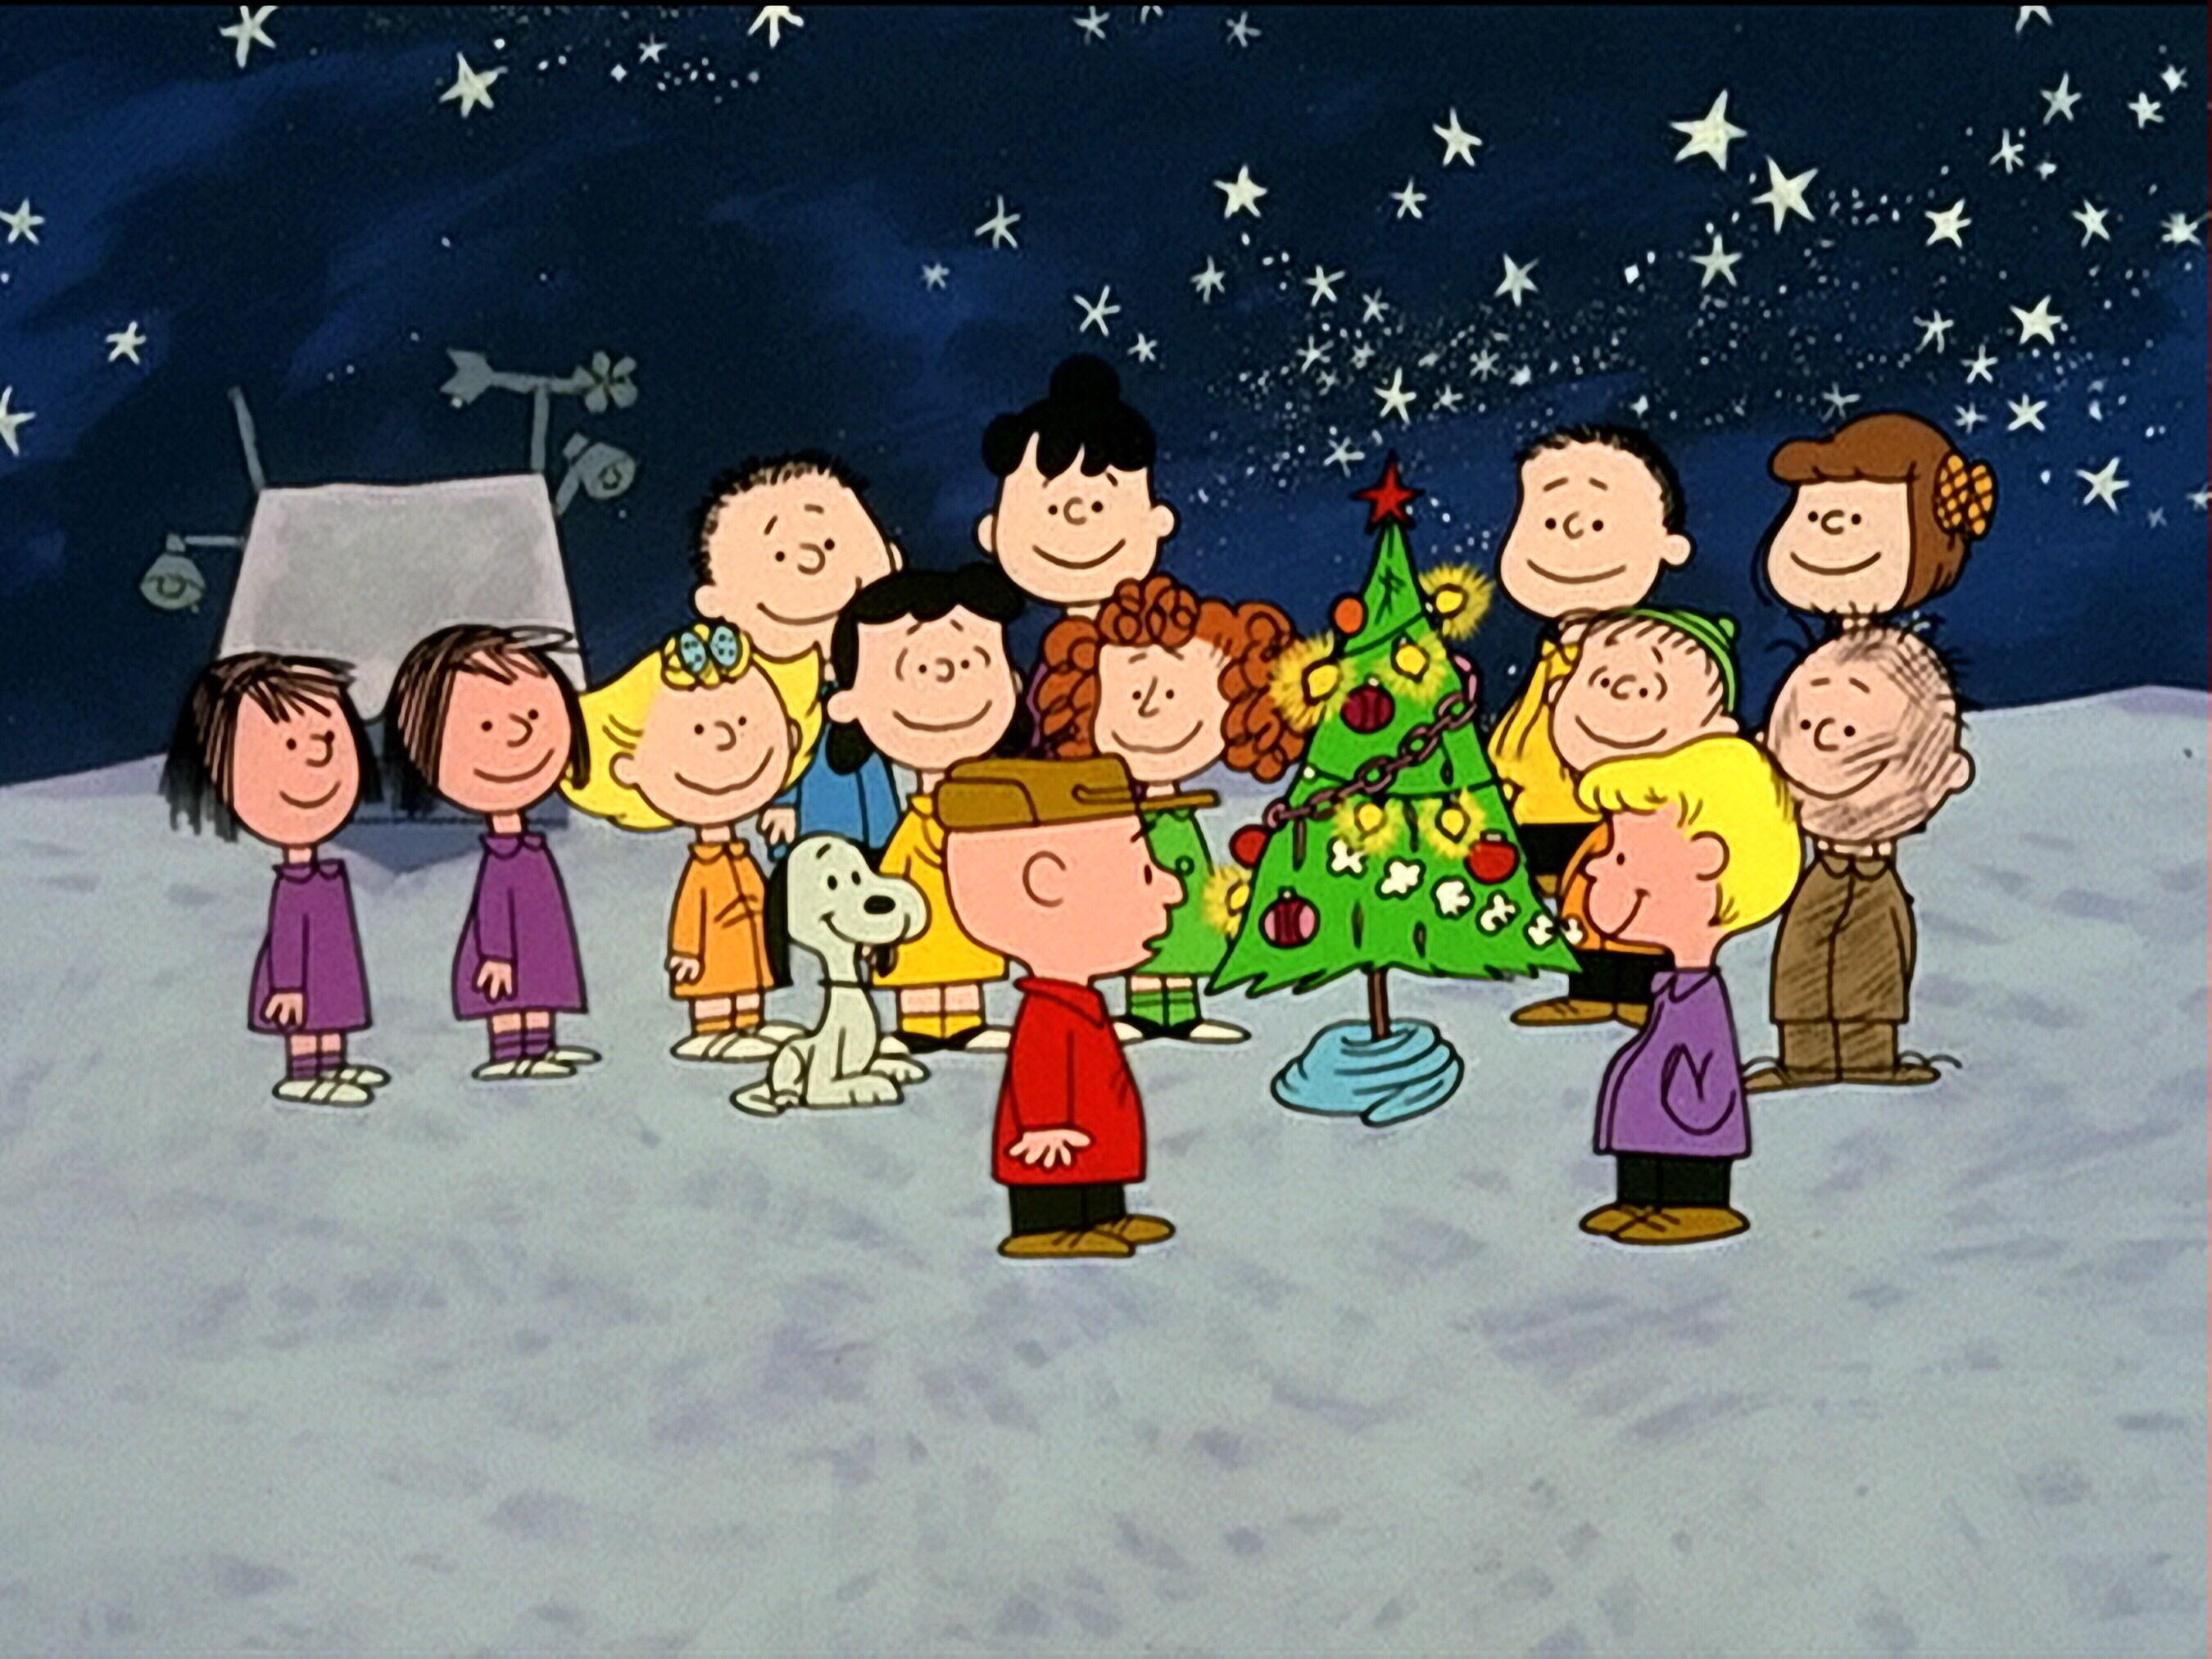 A Charlie Brown Christmas 2020 Broadcast Charlie Brown Christmas 2020 Broadcast   Yddnxy.vsenewyear.site